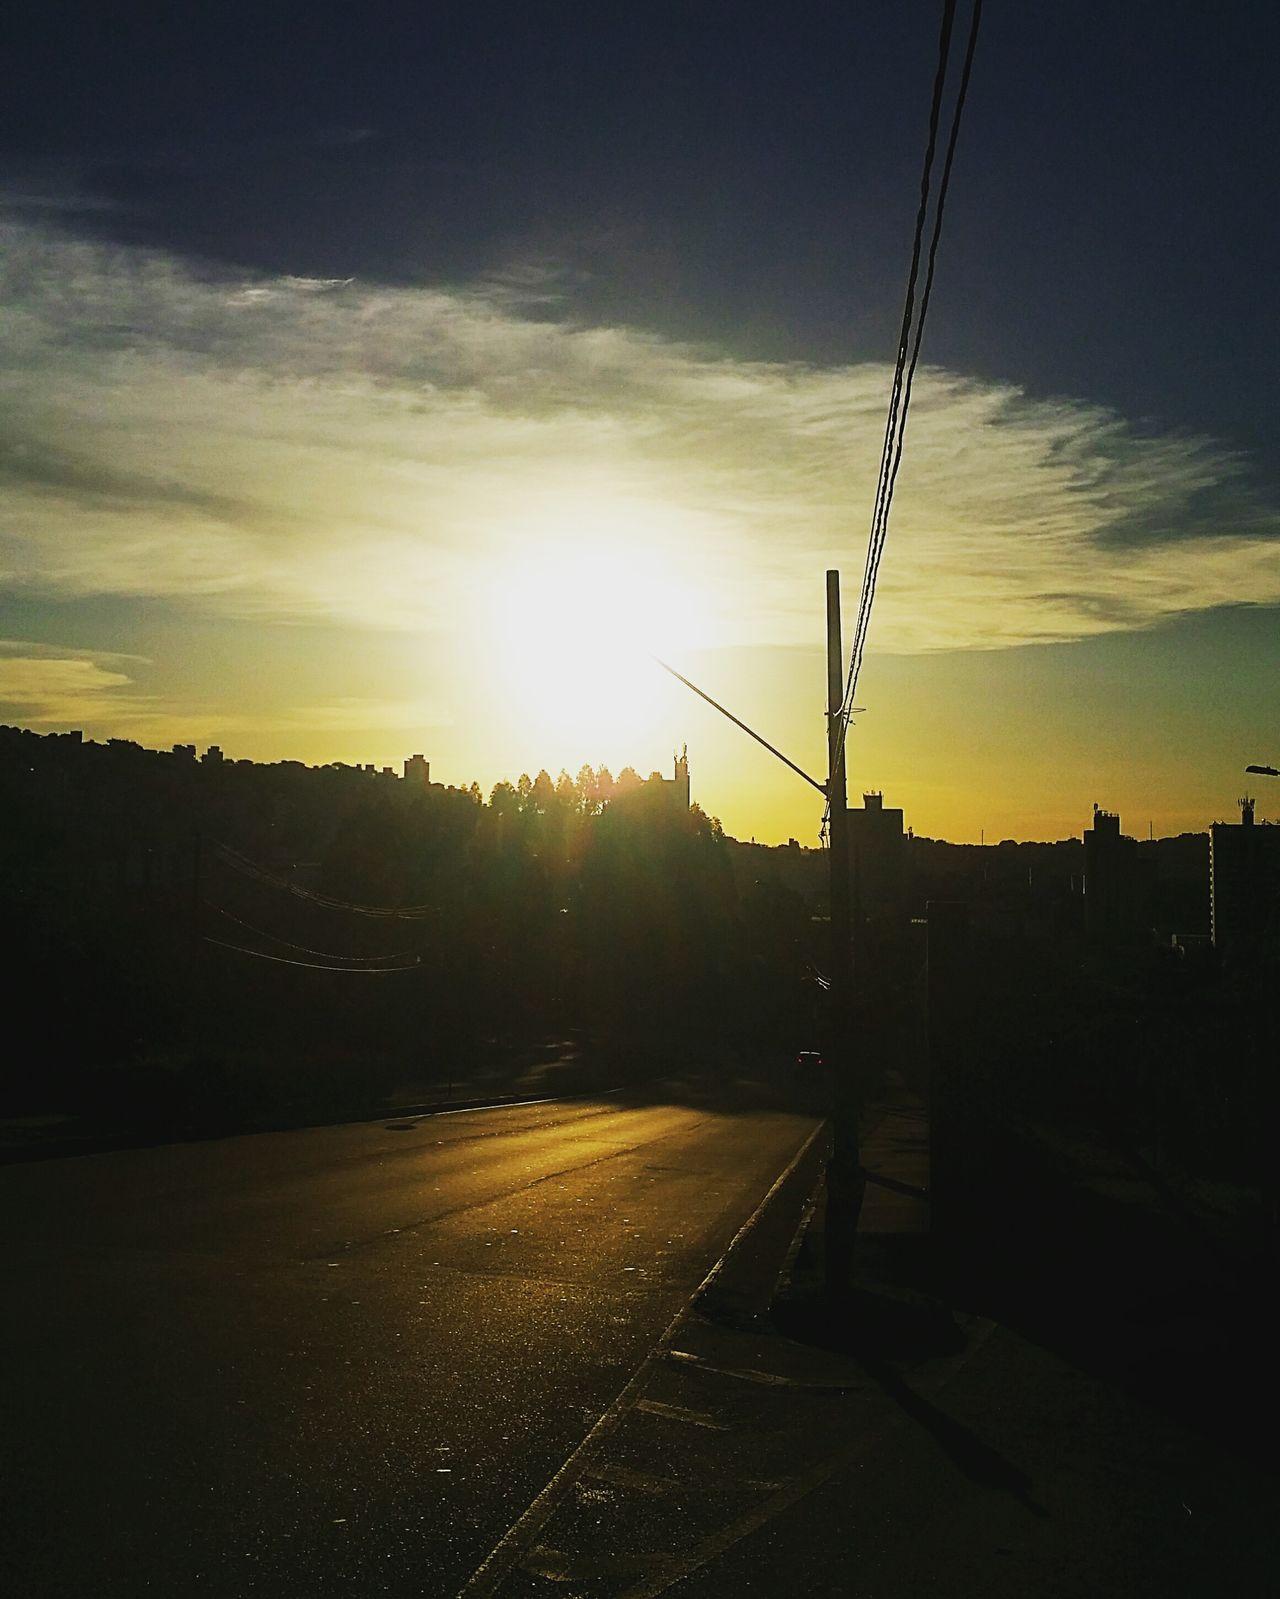 Sunset Cloud - Sky Photography Fotografia Eyeemphotography Photolovers Luminous Sole...☀ Pordosol Smartphonephotography Mobilephotography Mobilephoto Belohorizontecity Belo Horizonte, Brasil Minas Gerais-Brazil Sun